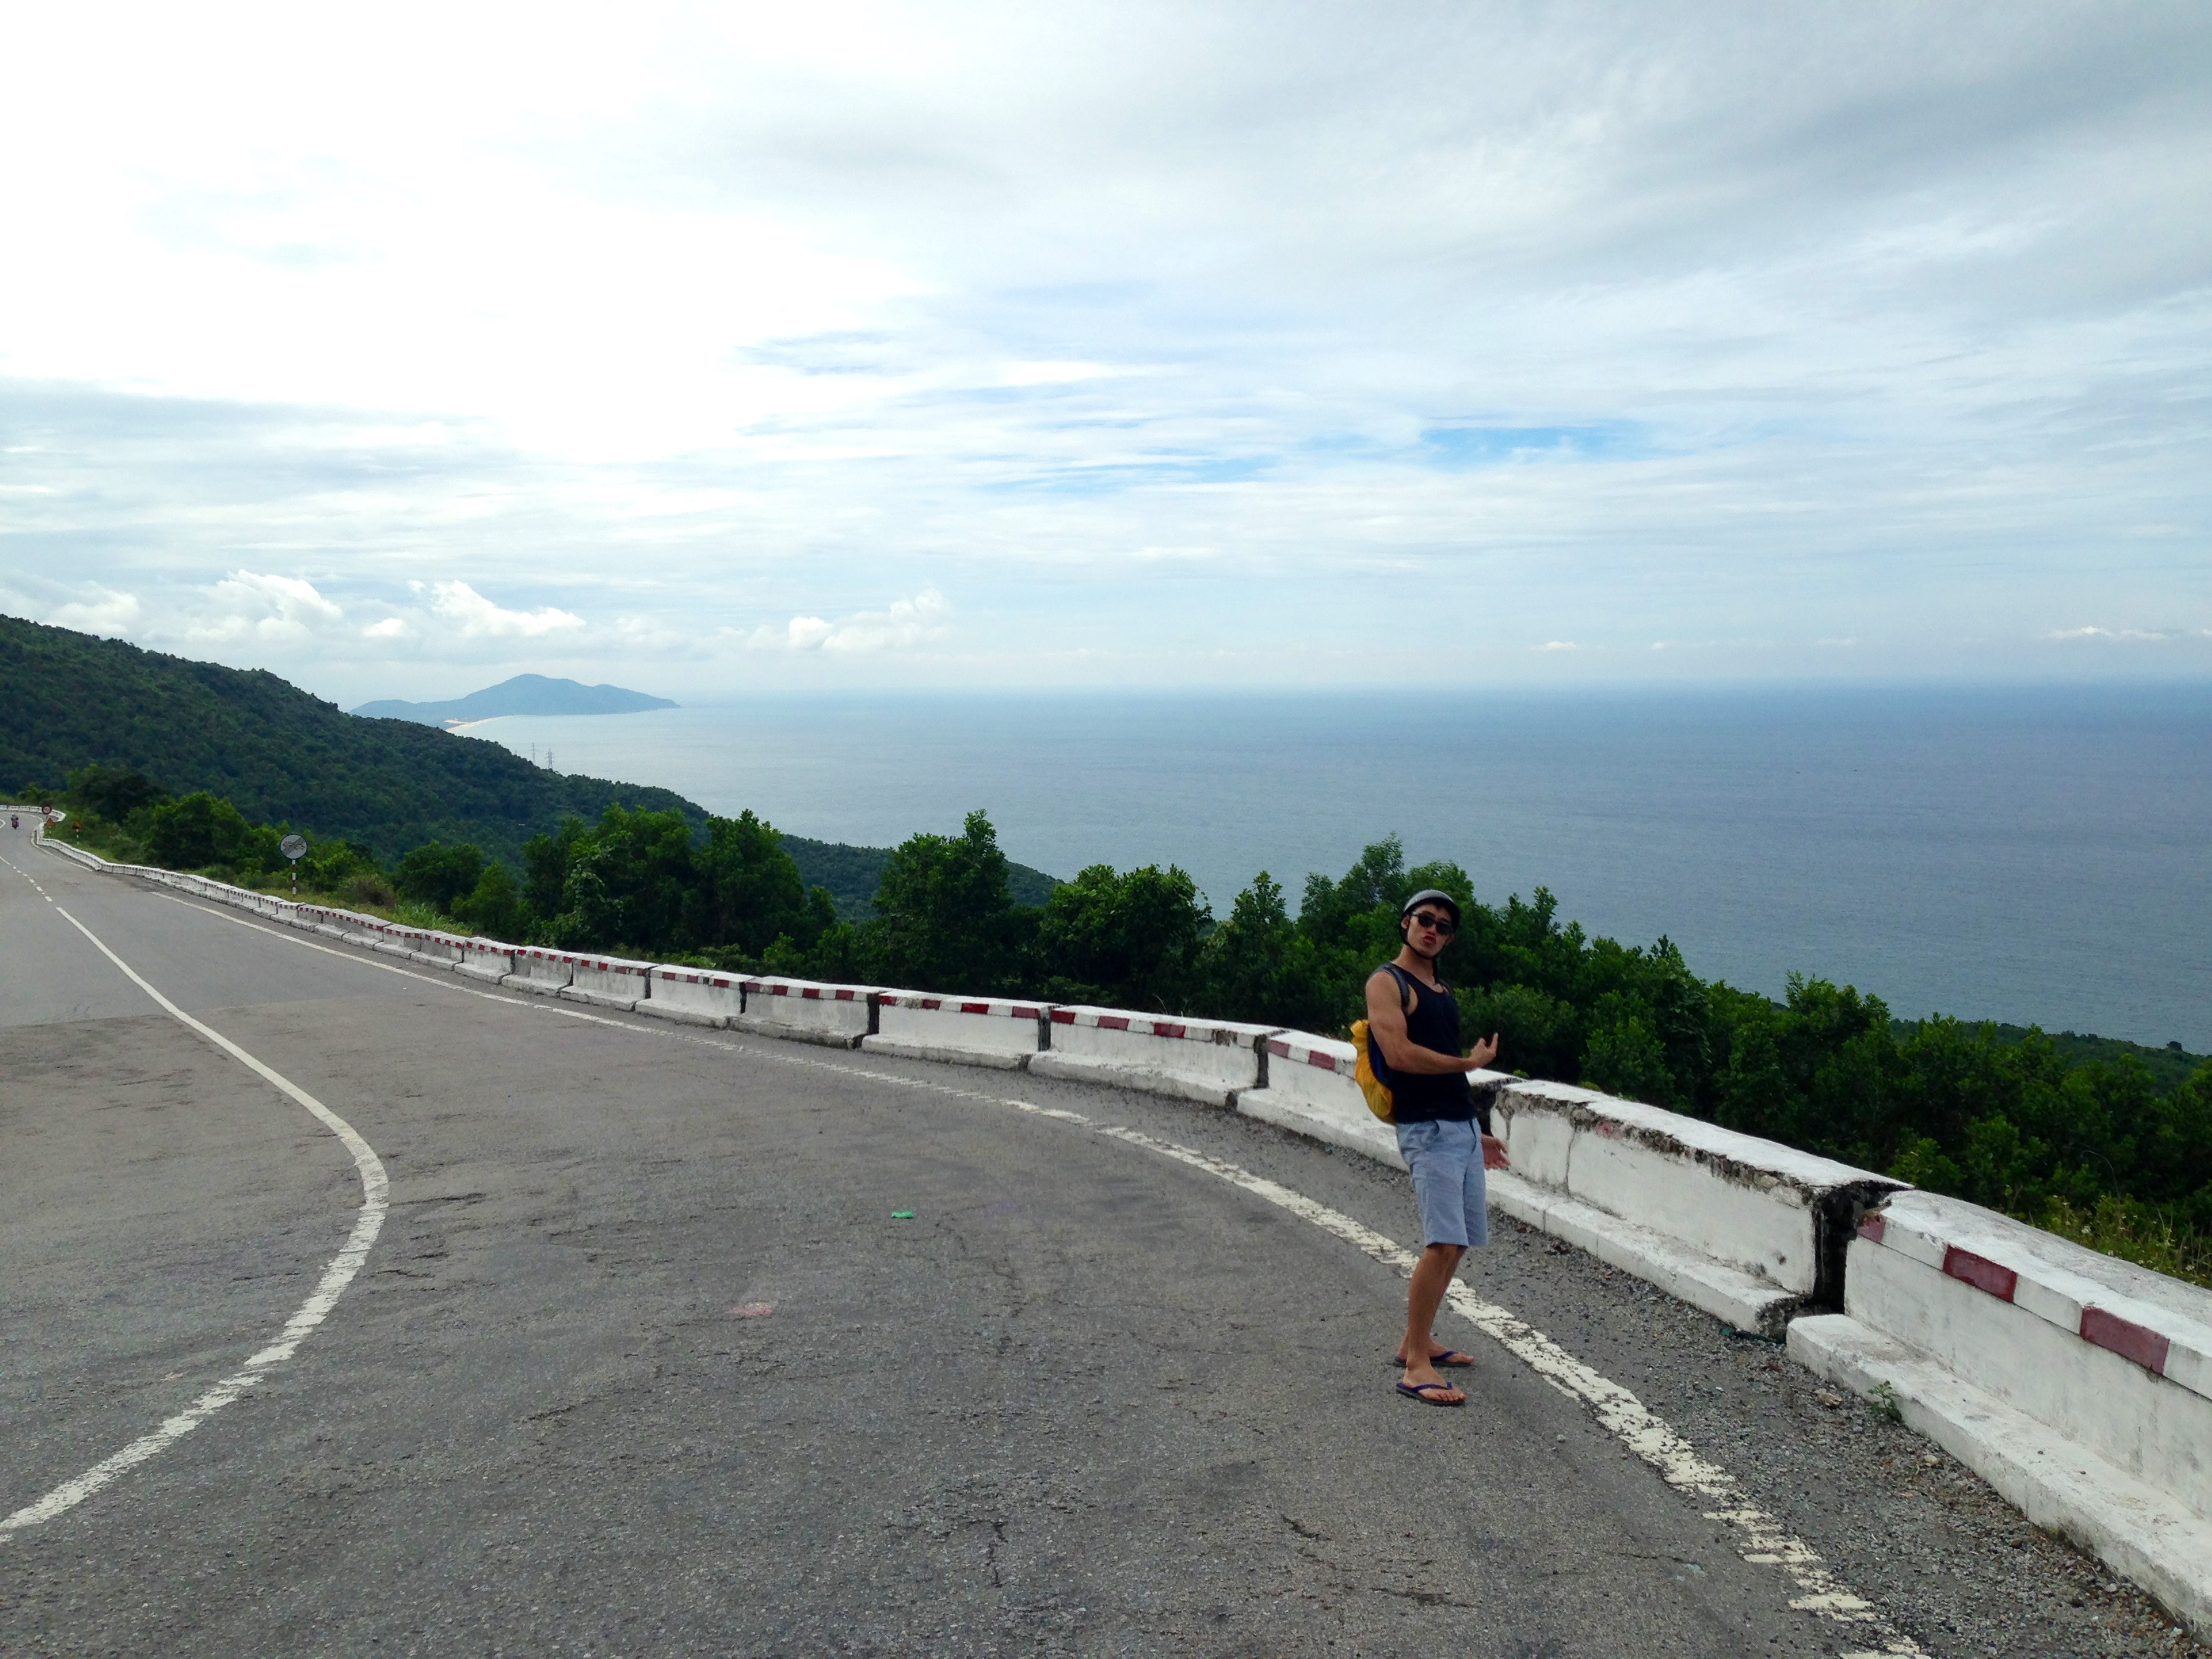 coast of Vietnam - bucket list